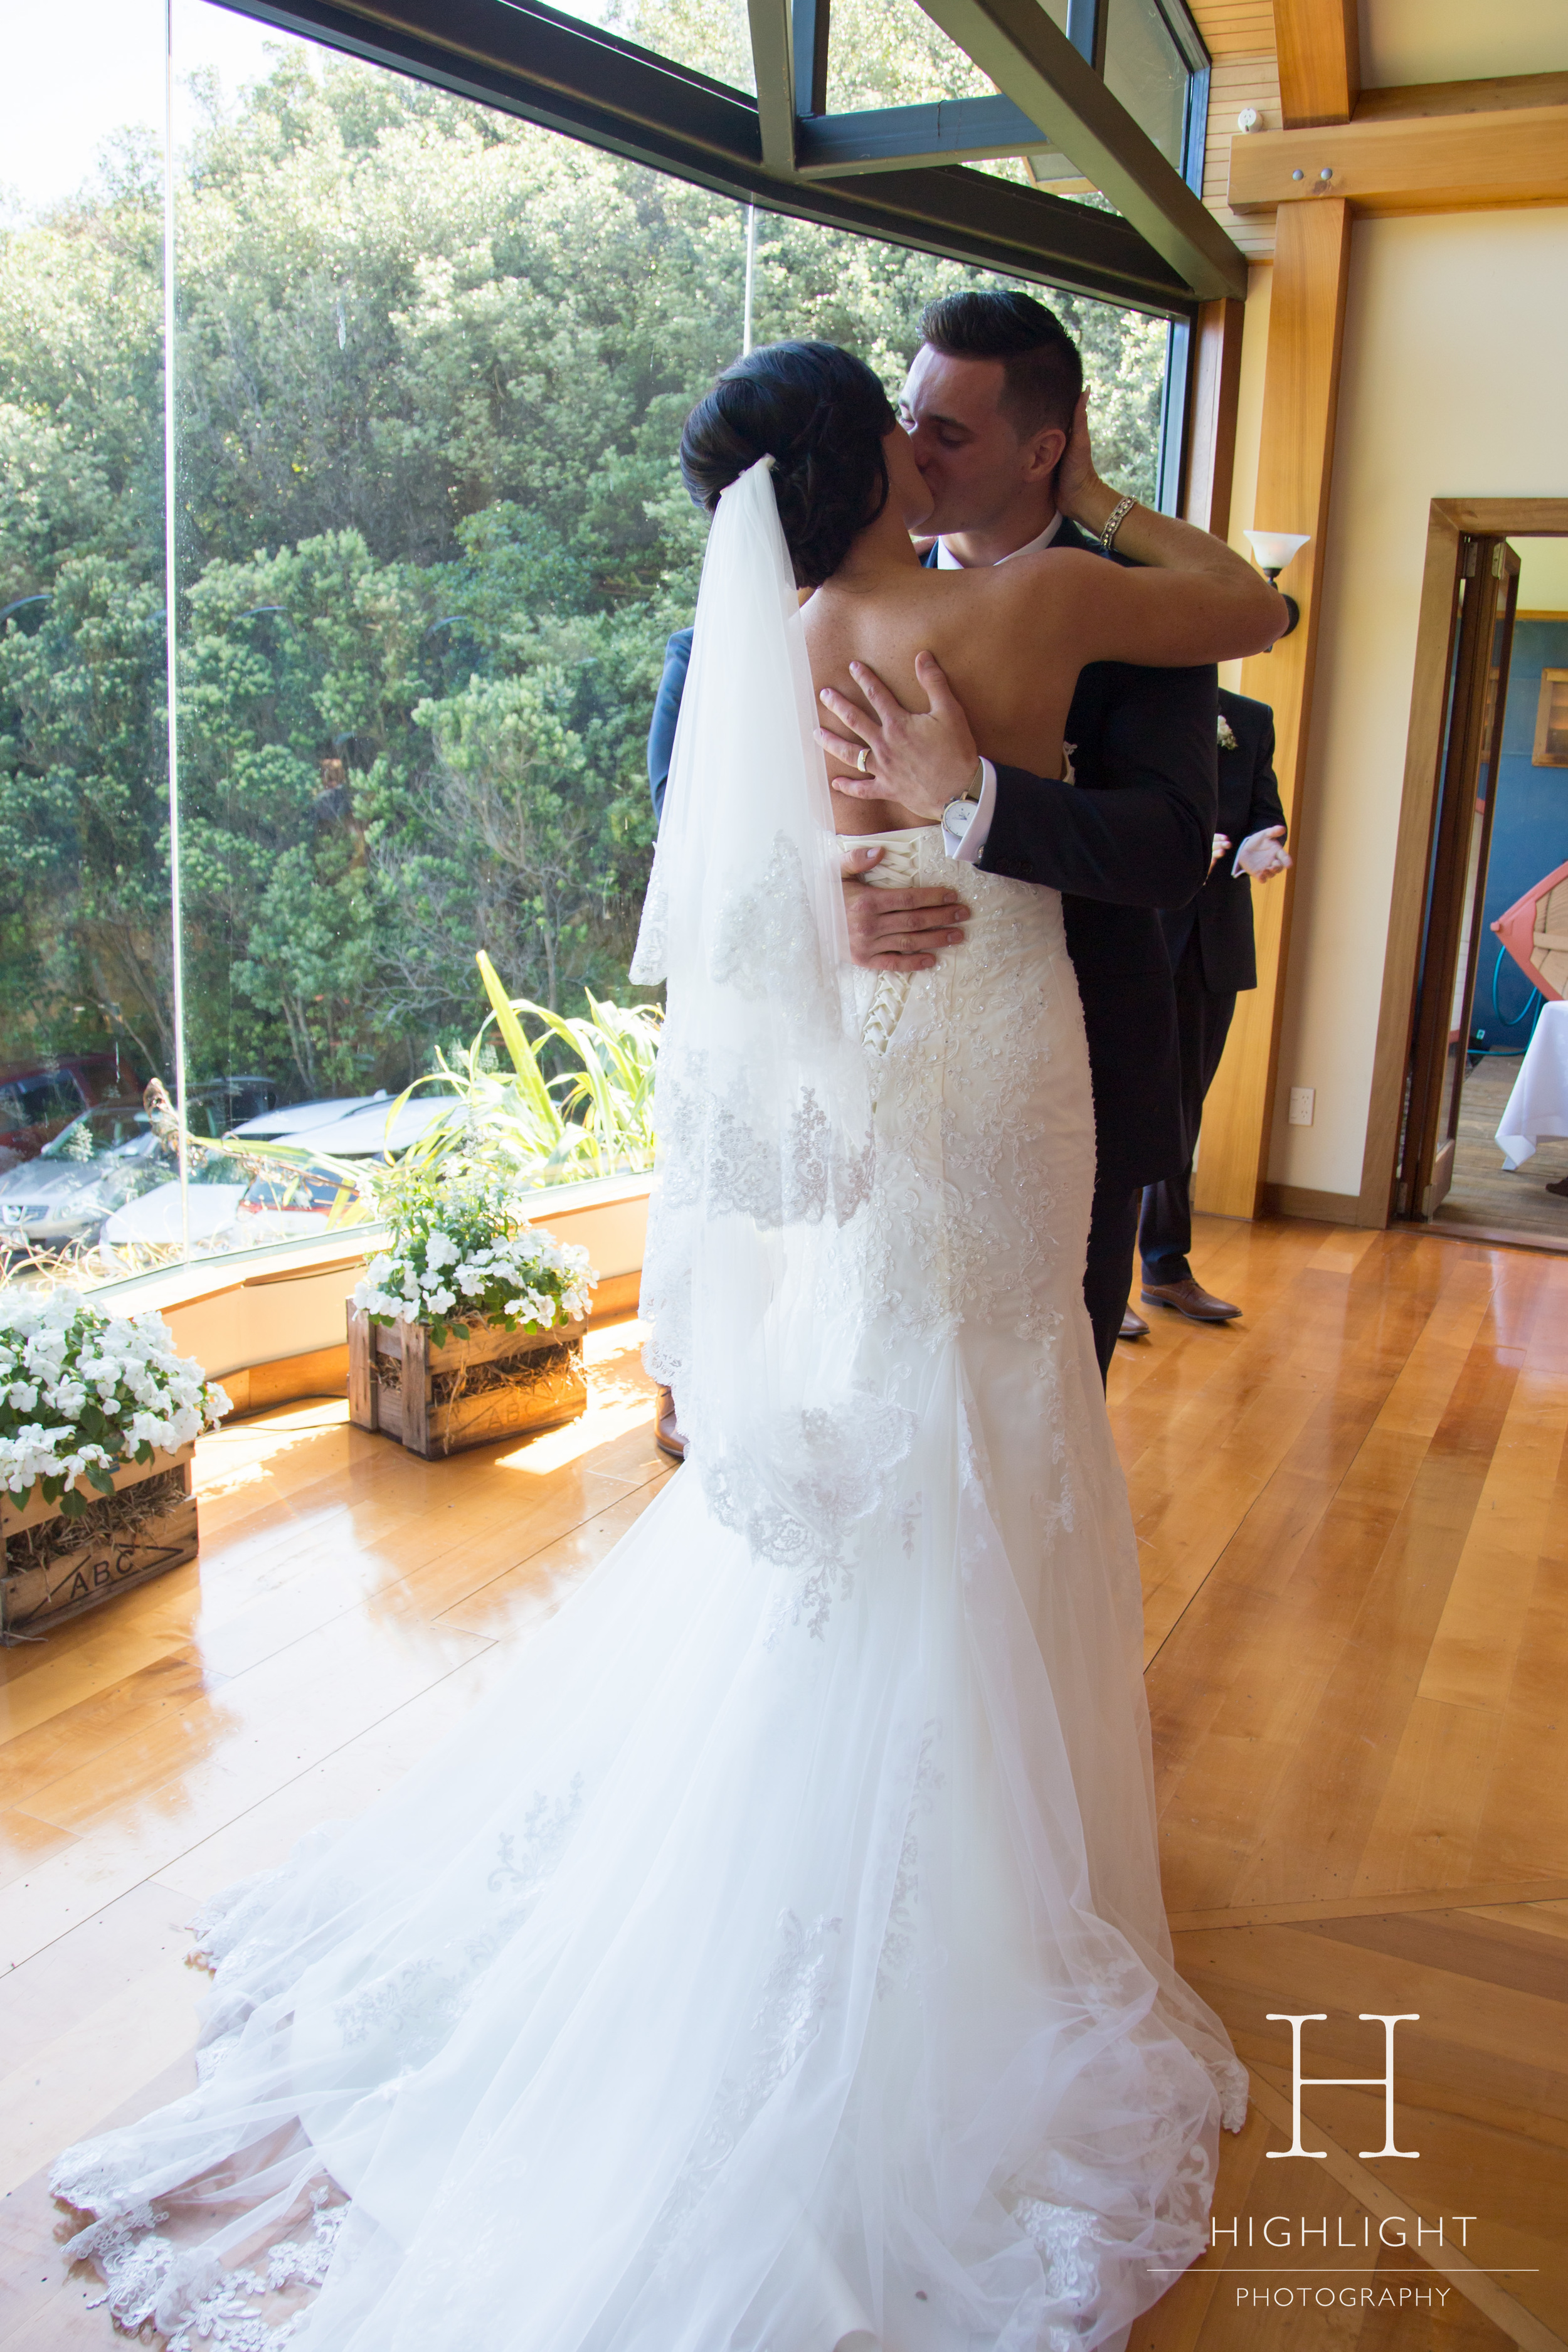 highlight_photography_wedding_new_zealand_kiss.jpg